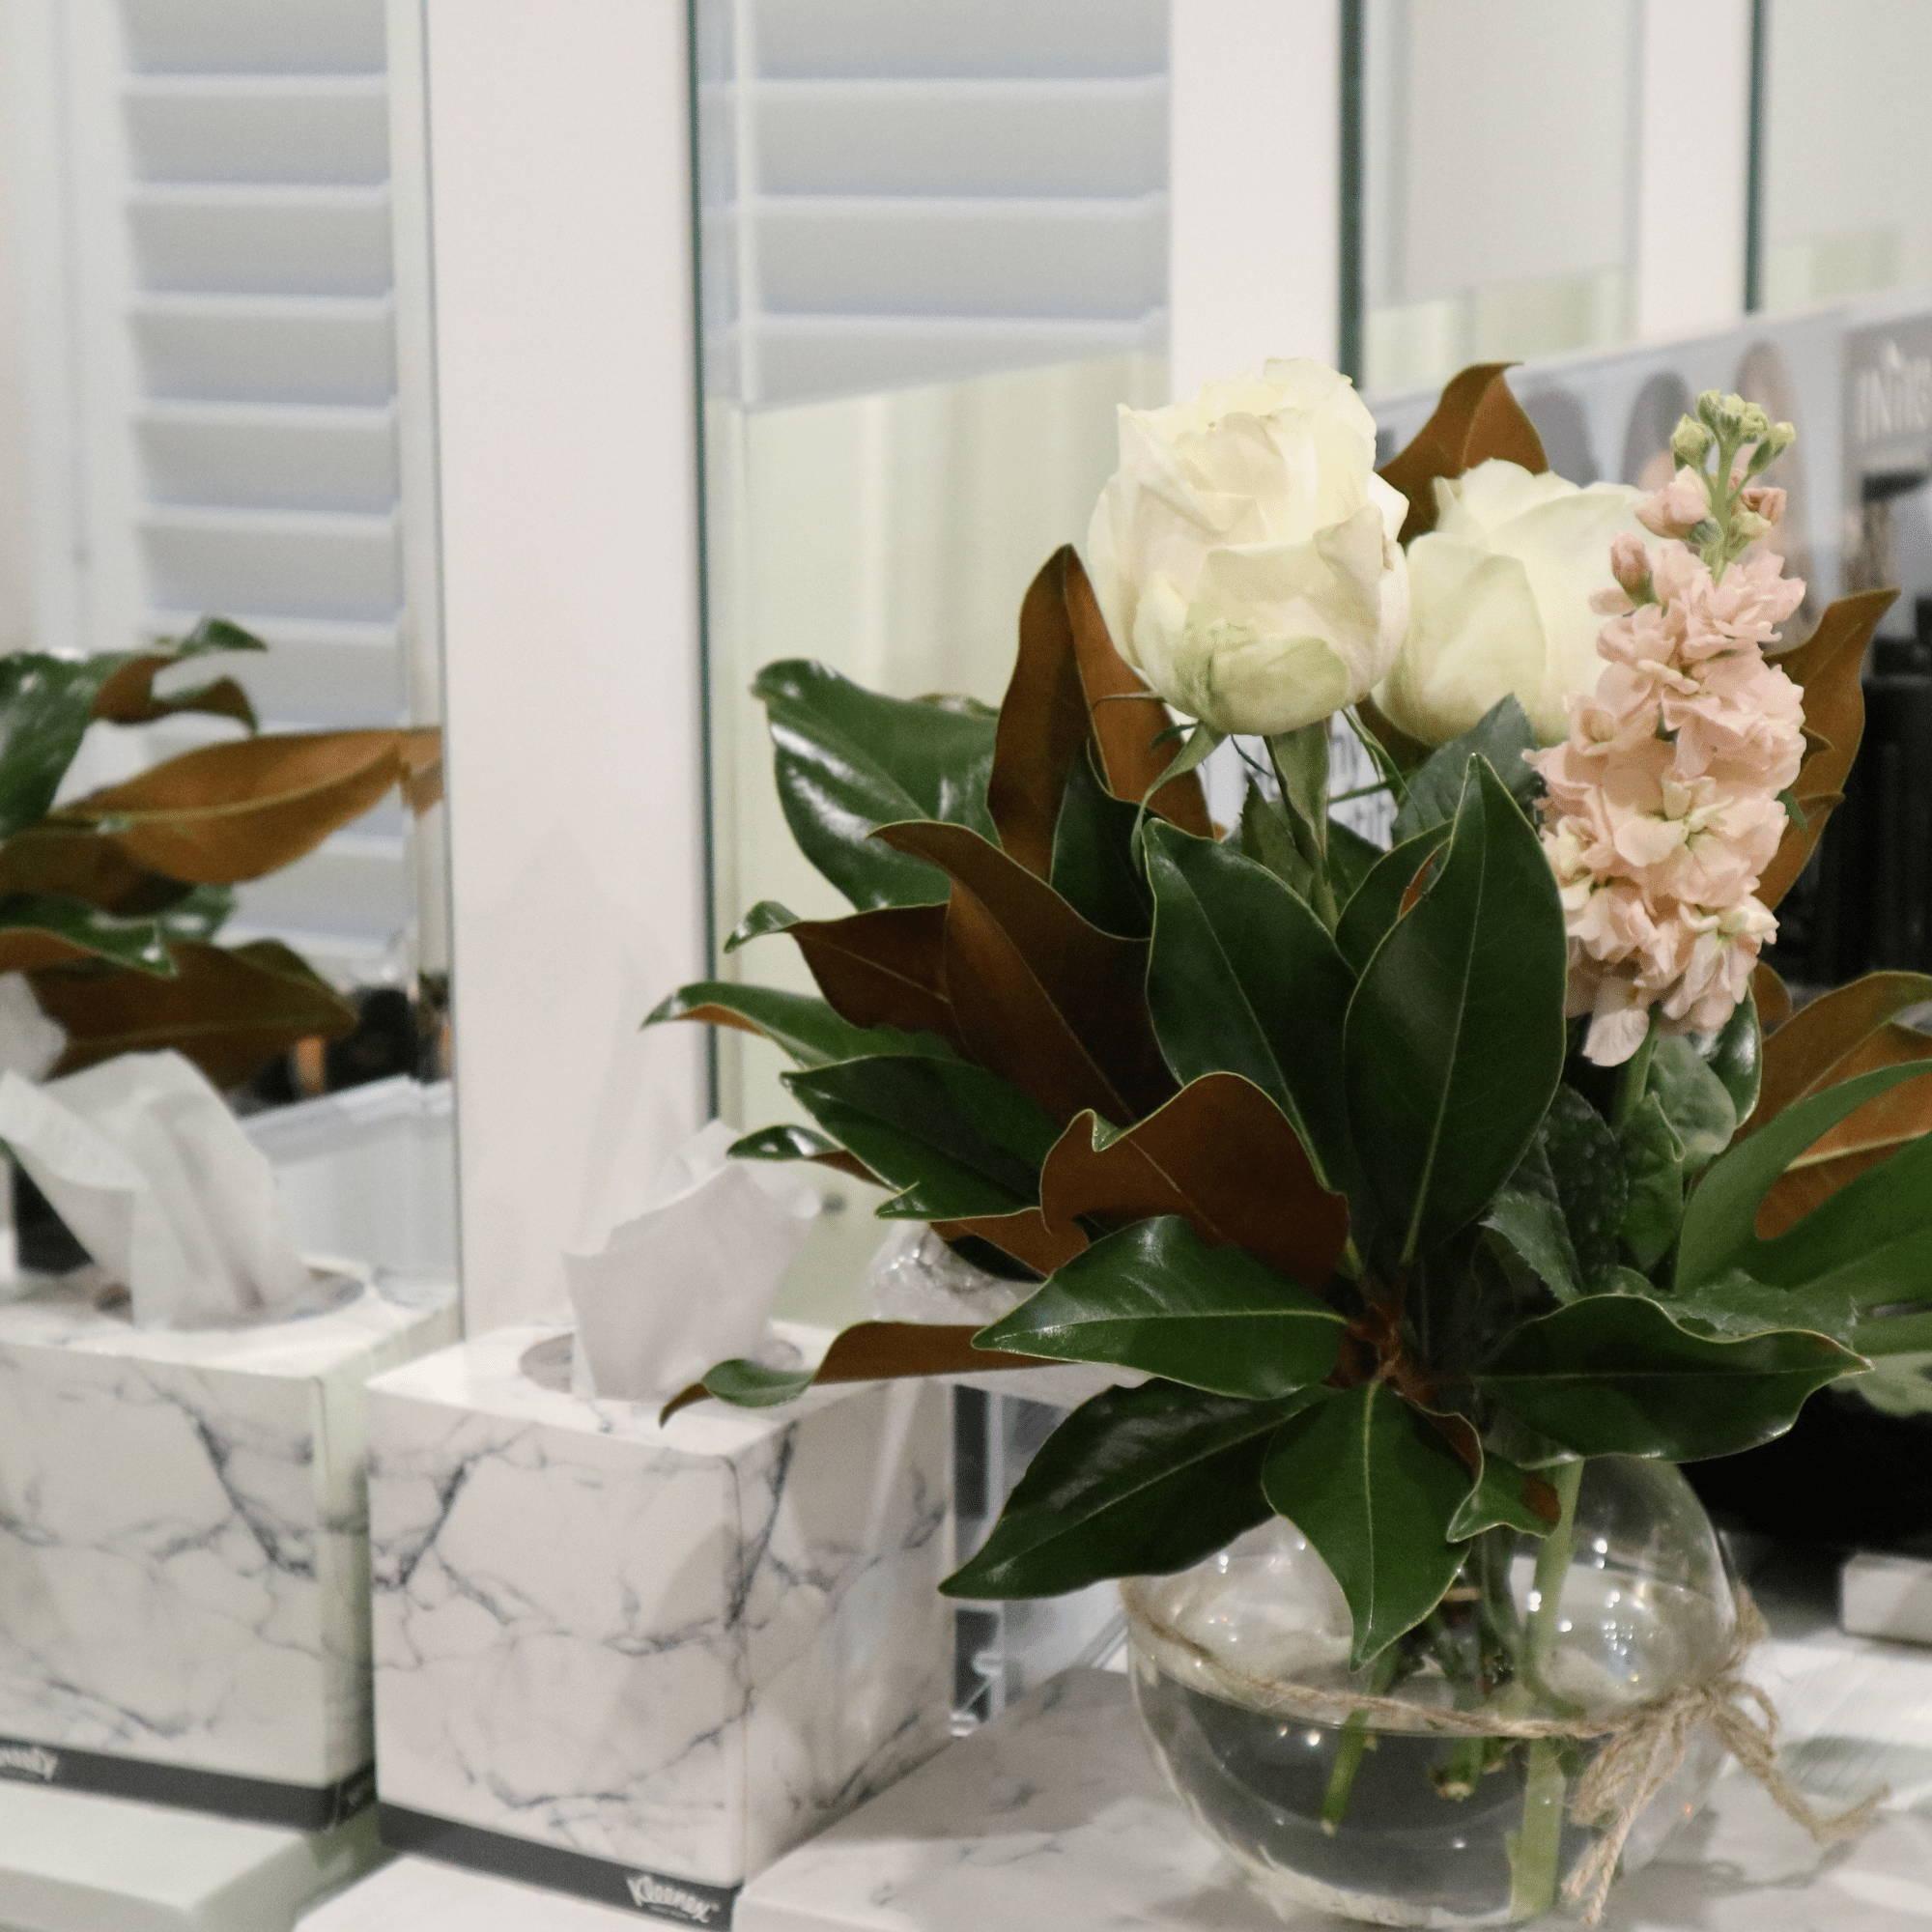 Flowers on Desk at our Australian Skin Clinic